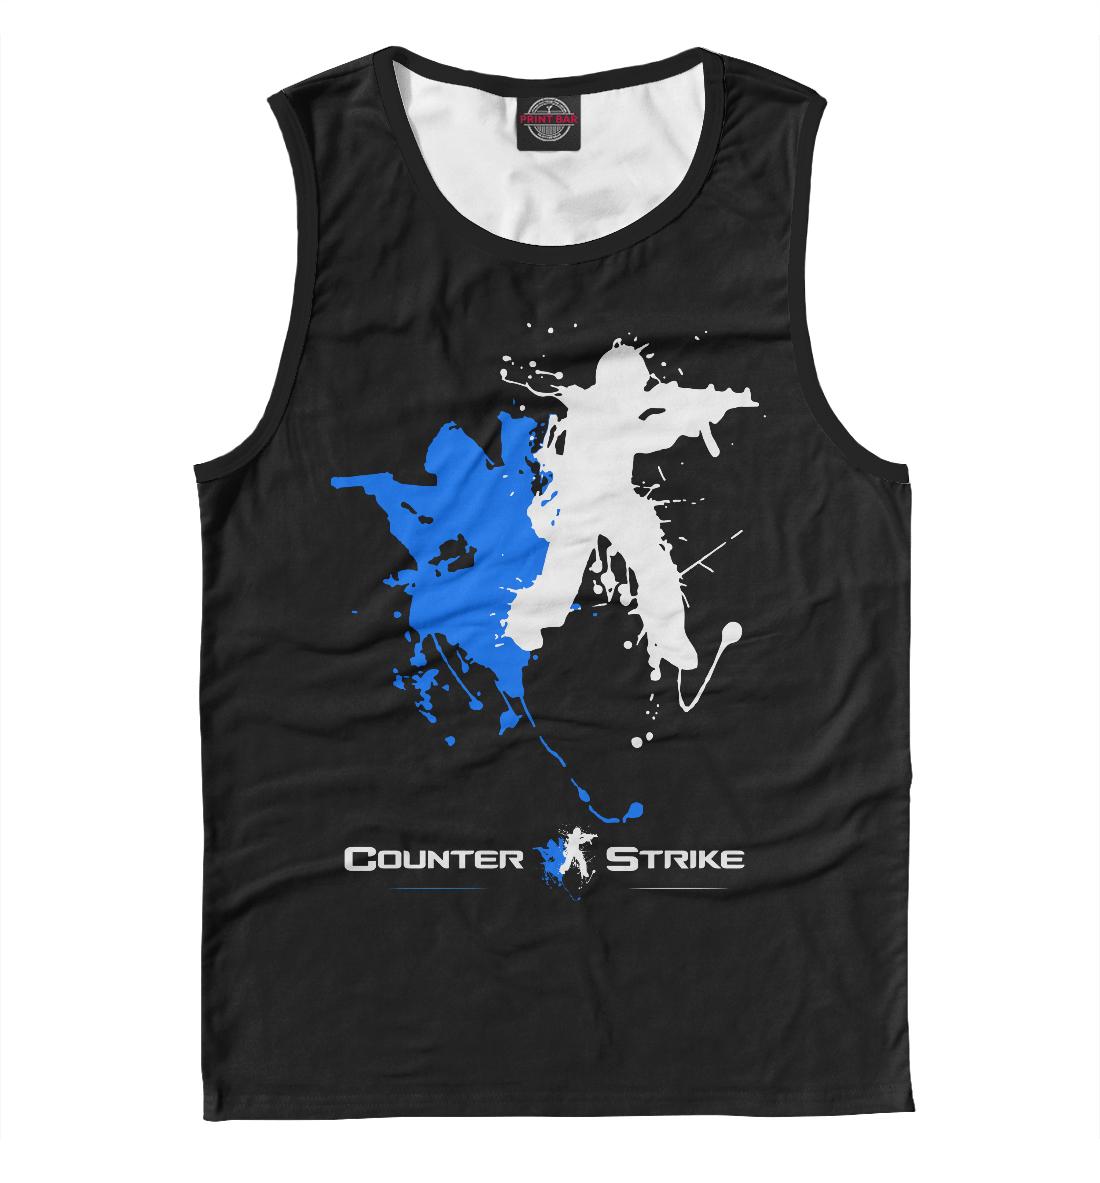 Купить Counter-Strike: Global Offensive, Printbar, Майки, COU-731501-may-2